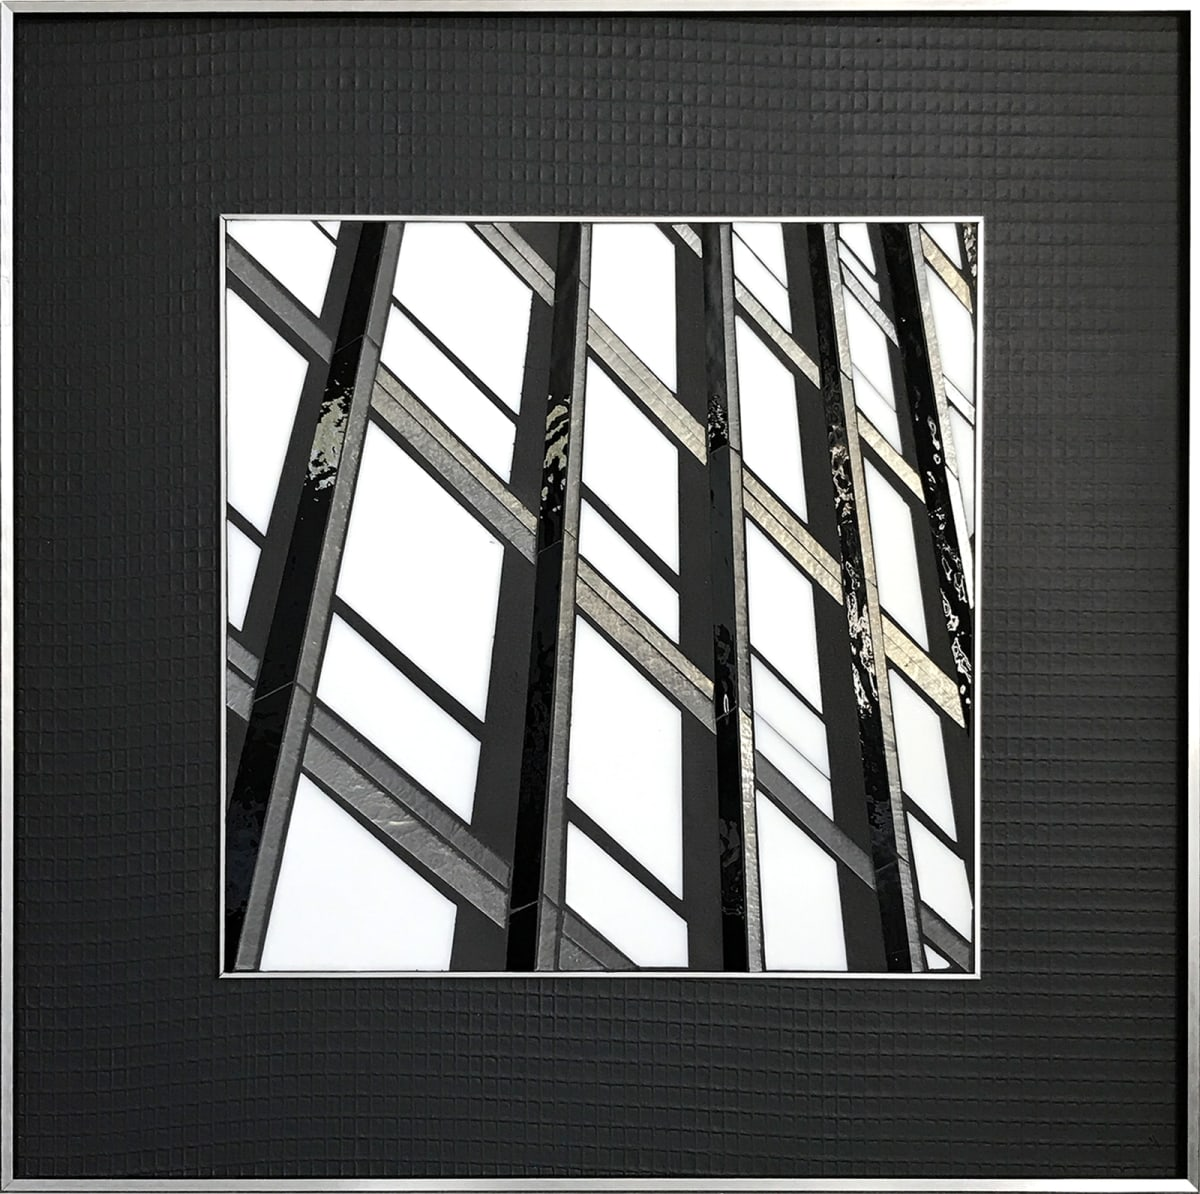 "Heather Hancock Reflect 2.13 (Mies) Glass/ Mixed Media 22 x 22"" framed"